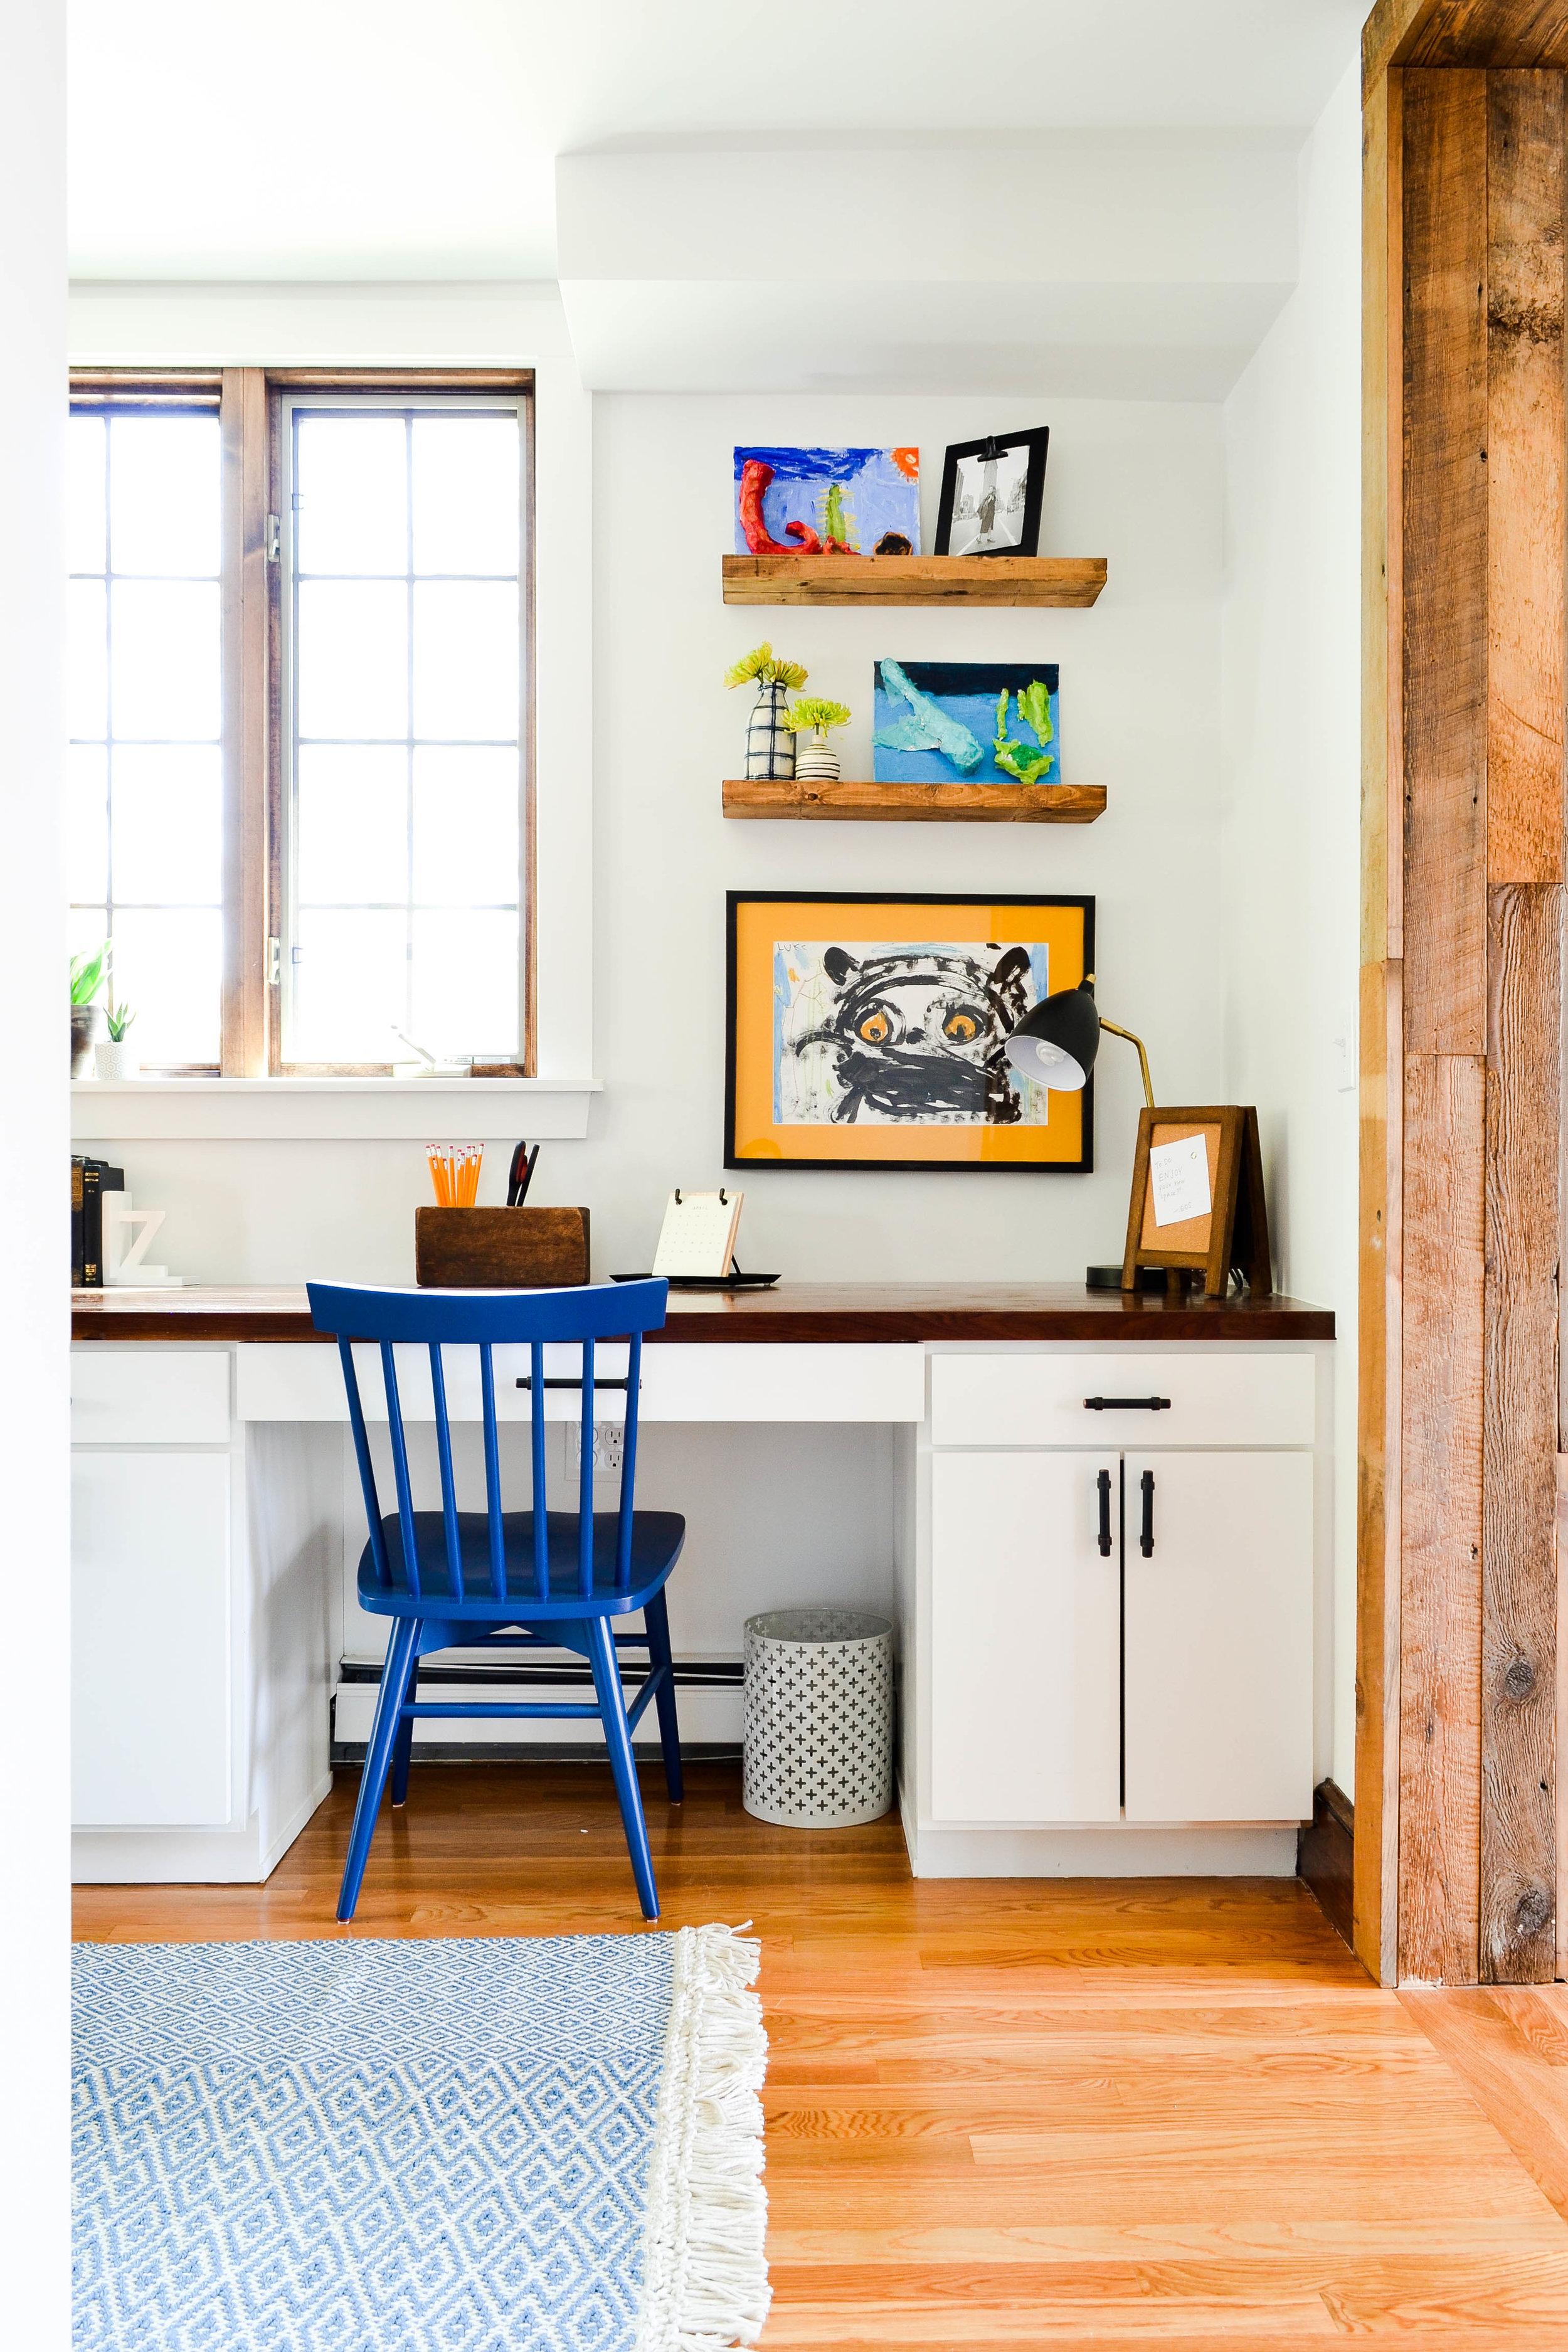 Gray Oak Studio Pilgrim Project Office - decor and details